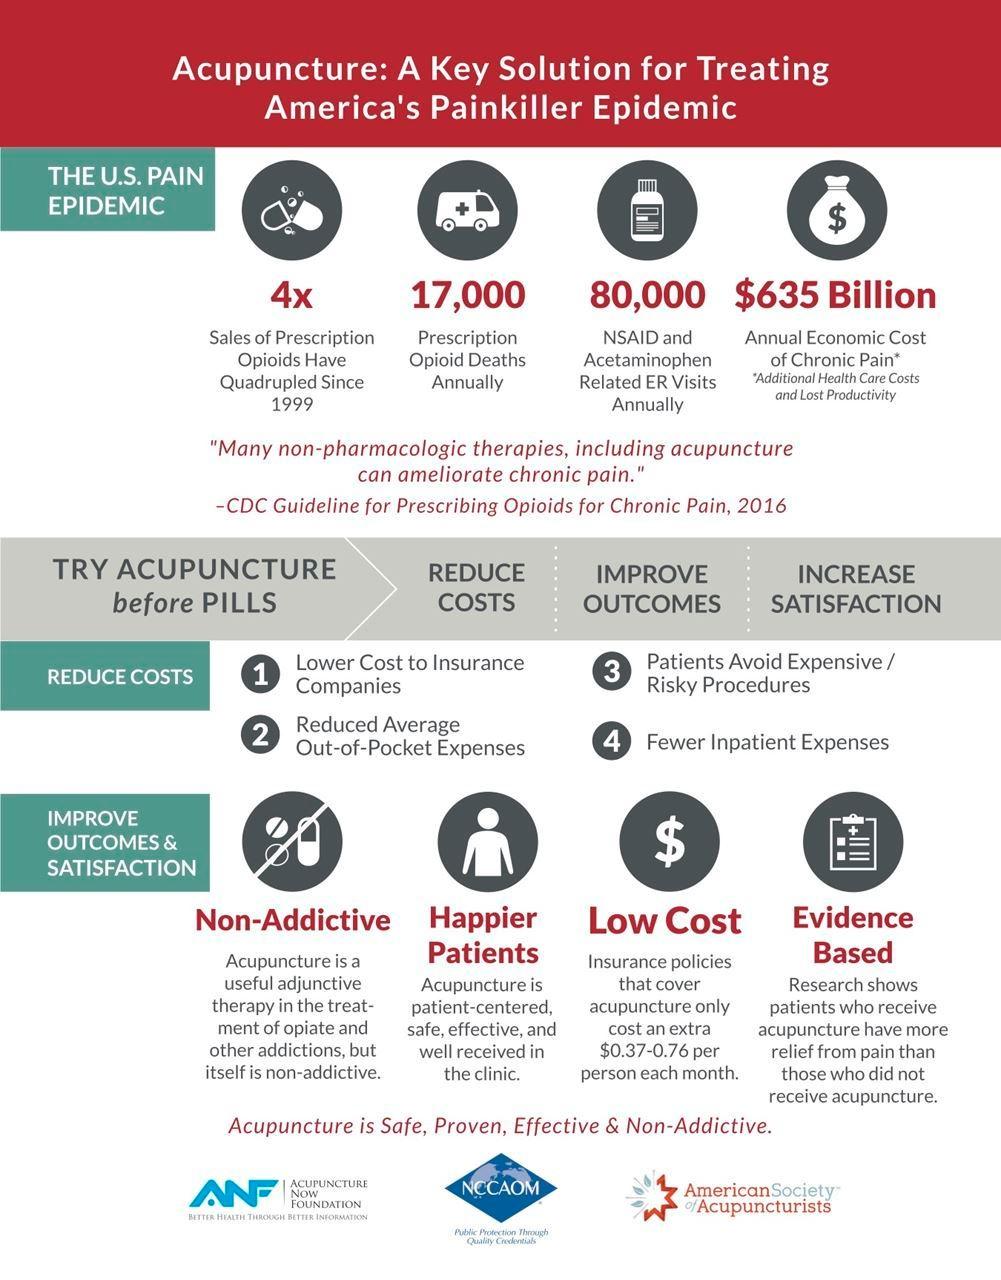 Acupuncture Before Opioids